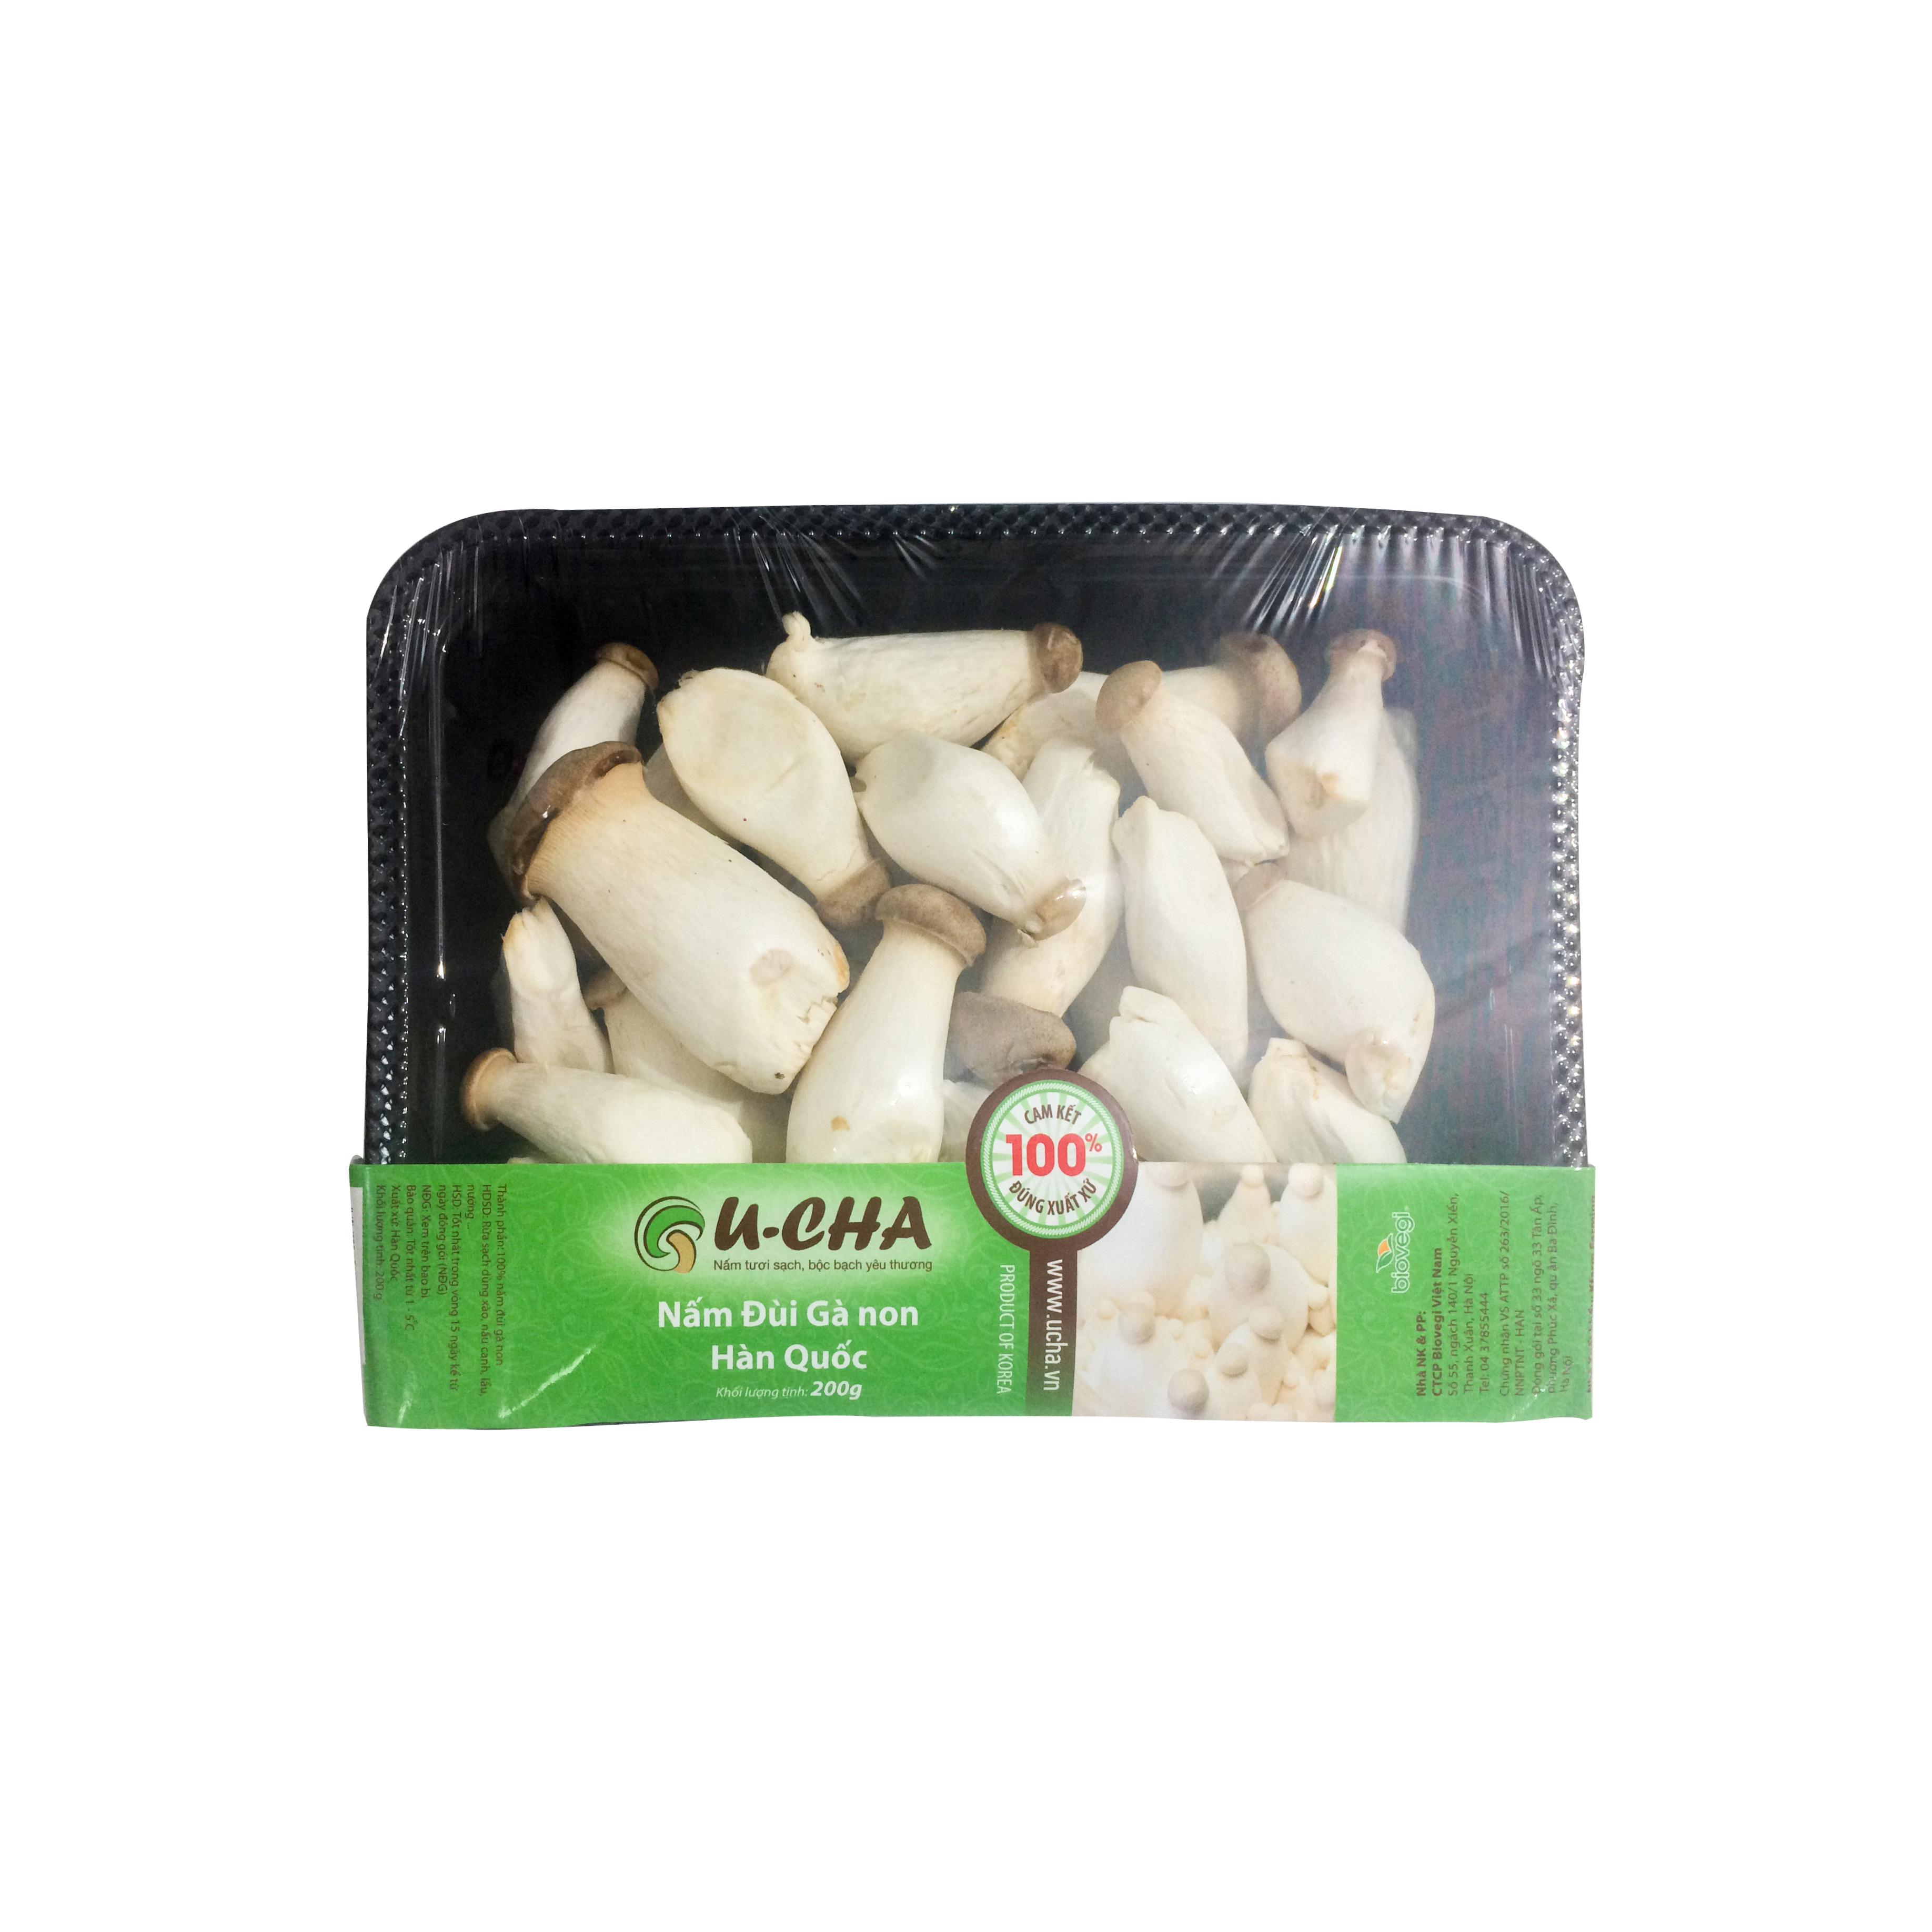 Baby King oyster mushroom Korea